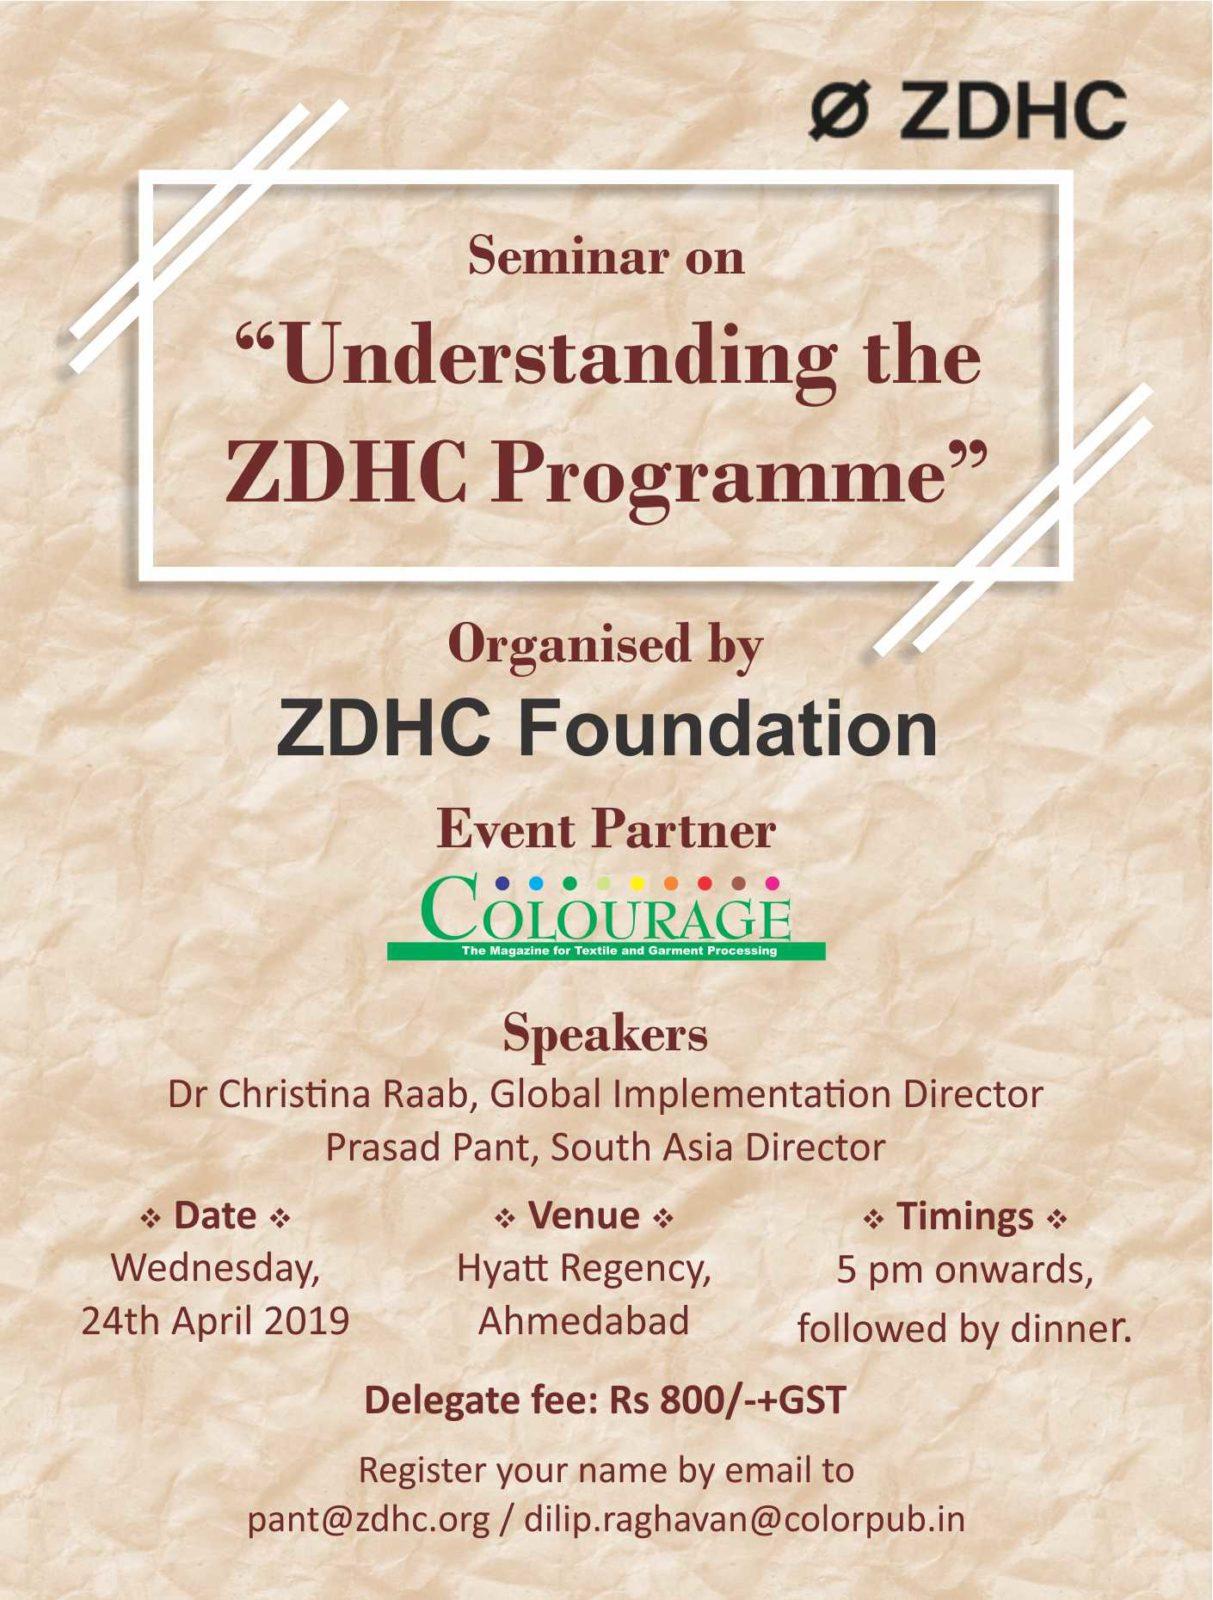 ZDHC Seminar - 24 April 2019, Ahmedabad